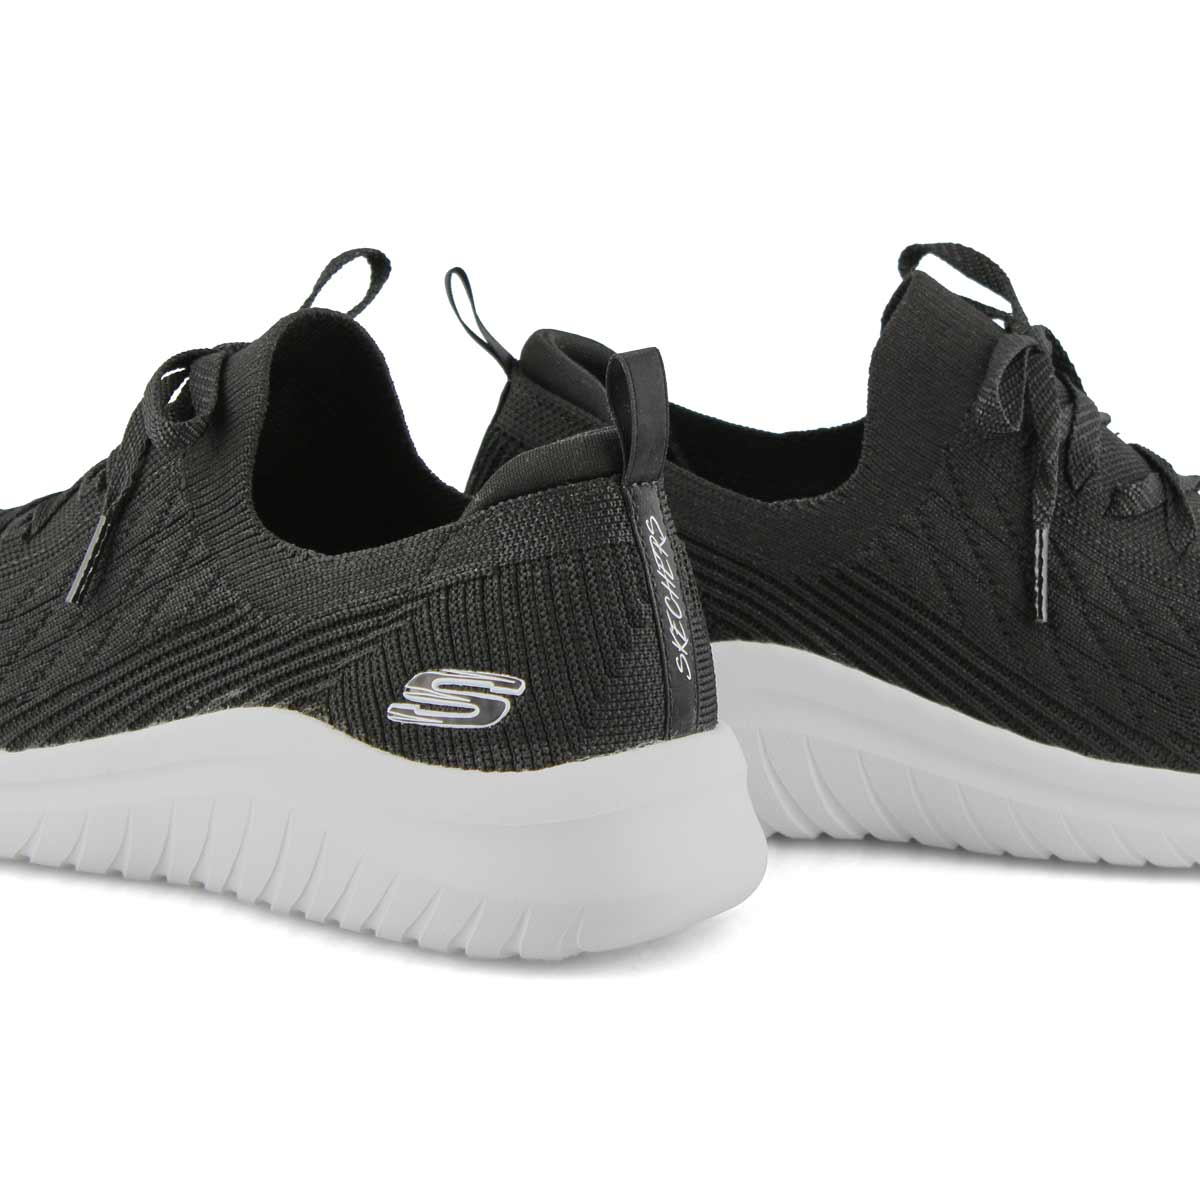 Women's Ultra Flex 2.0 Sneaker - Black/White